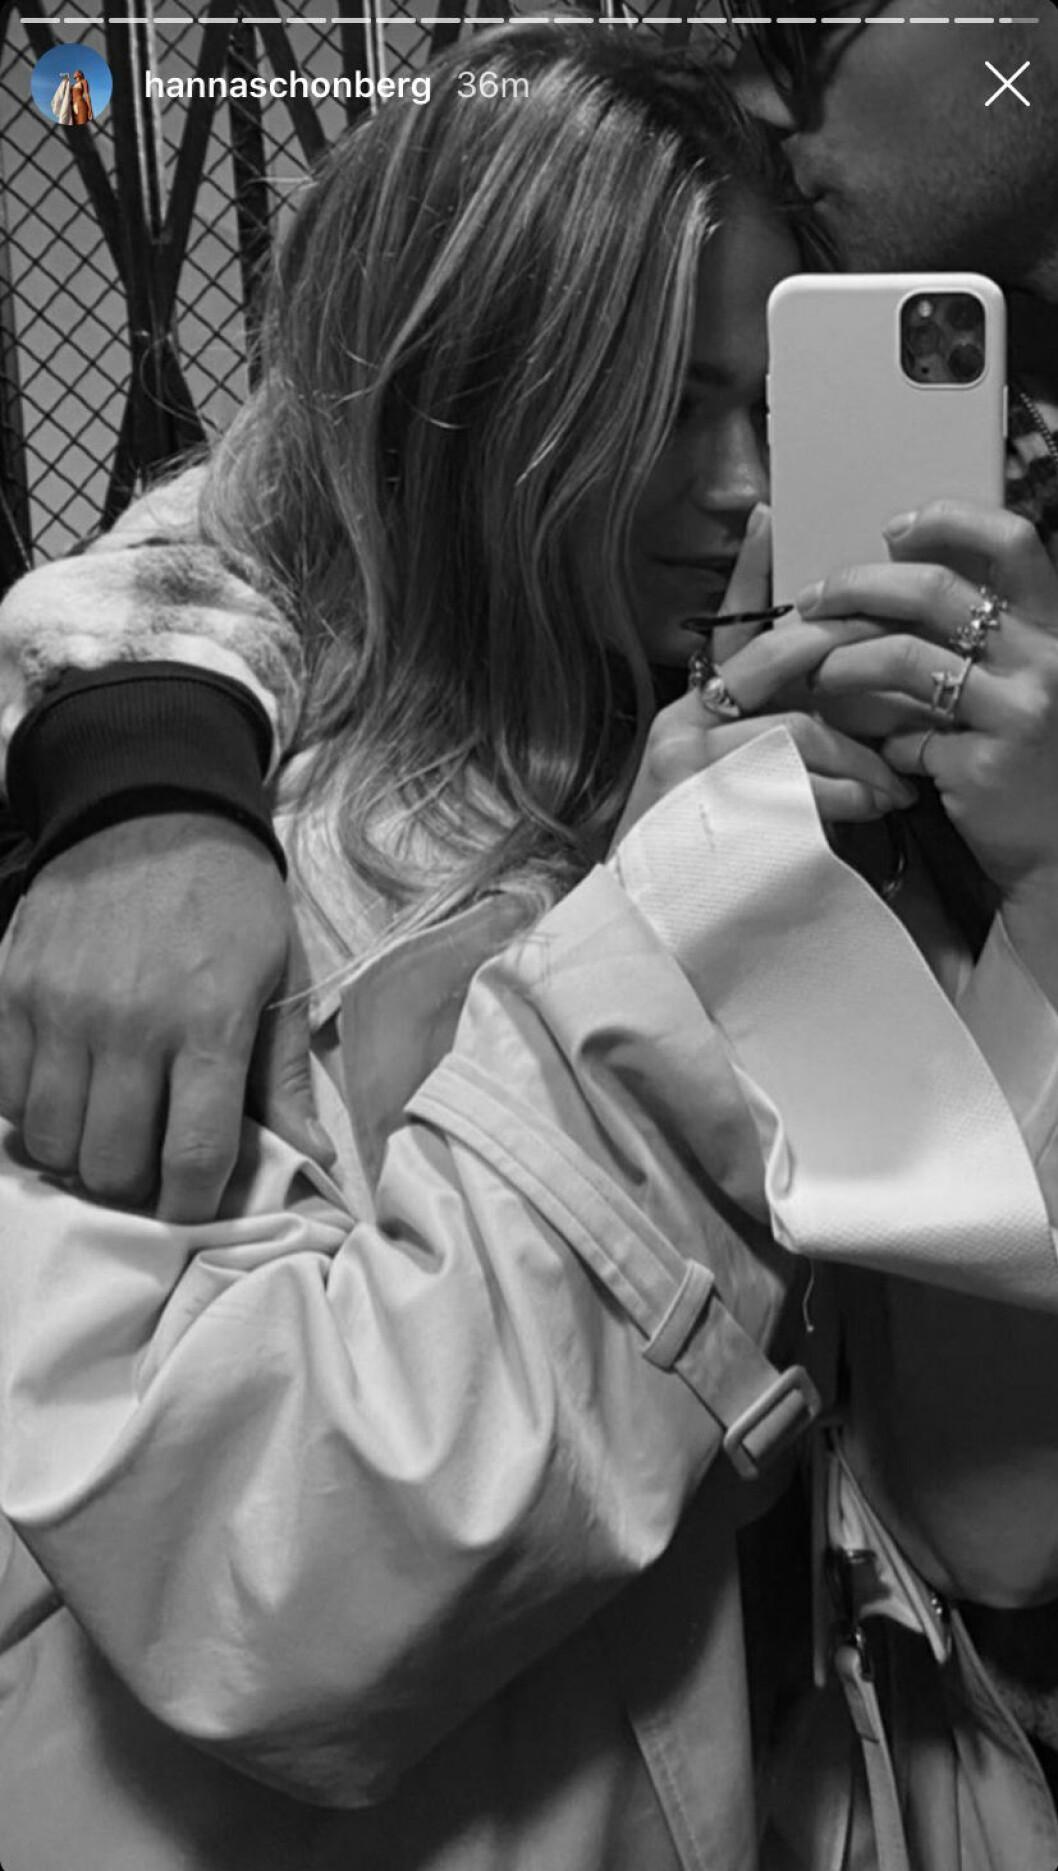 Eric Saade pussar Hanna Schönberg på pannan.